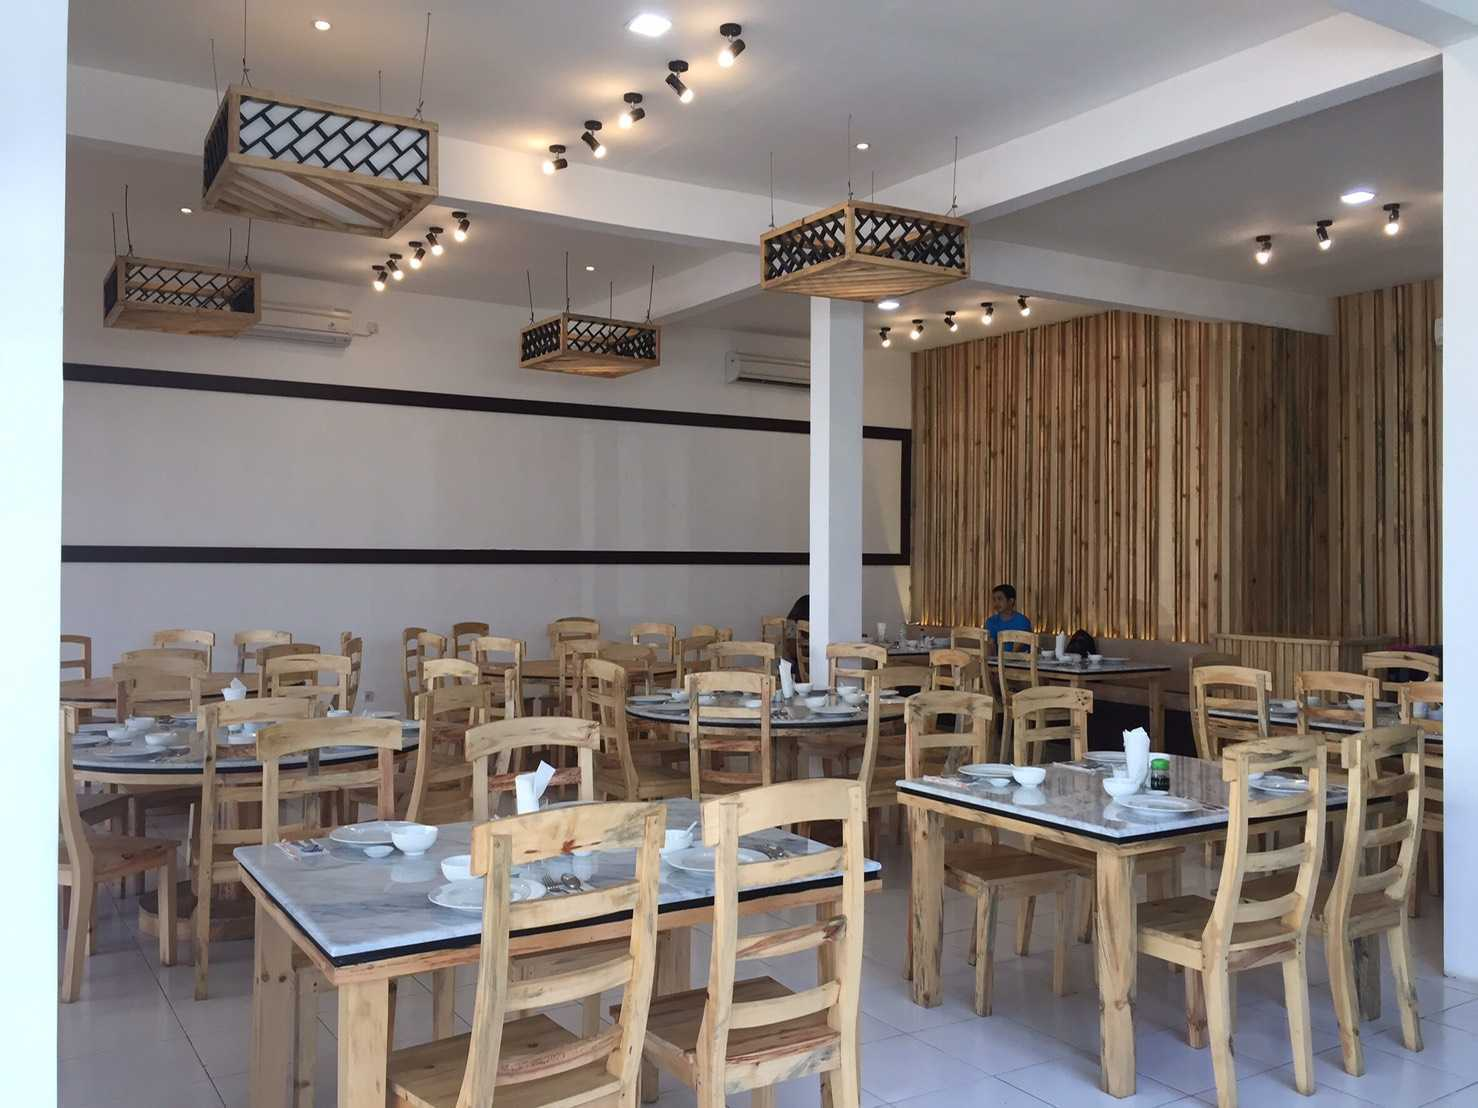 Alima Studio Uncle Chong Restaurant Jl. By Pass Ngurah Rai No.402, Sanur, Denpasar Sel., Bali, 80228, Indonesia Jl. By Pass Ngurah Rai No.402, Sanur, Denpasar Sel., Bali, 80228, Indonesia Alima-Studio-Uncle-Chong-Restaurant Asian  61868